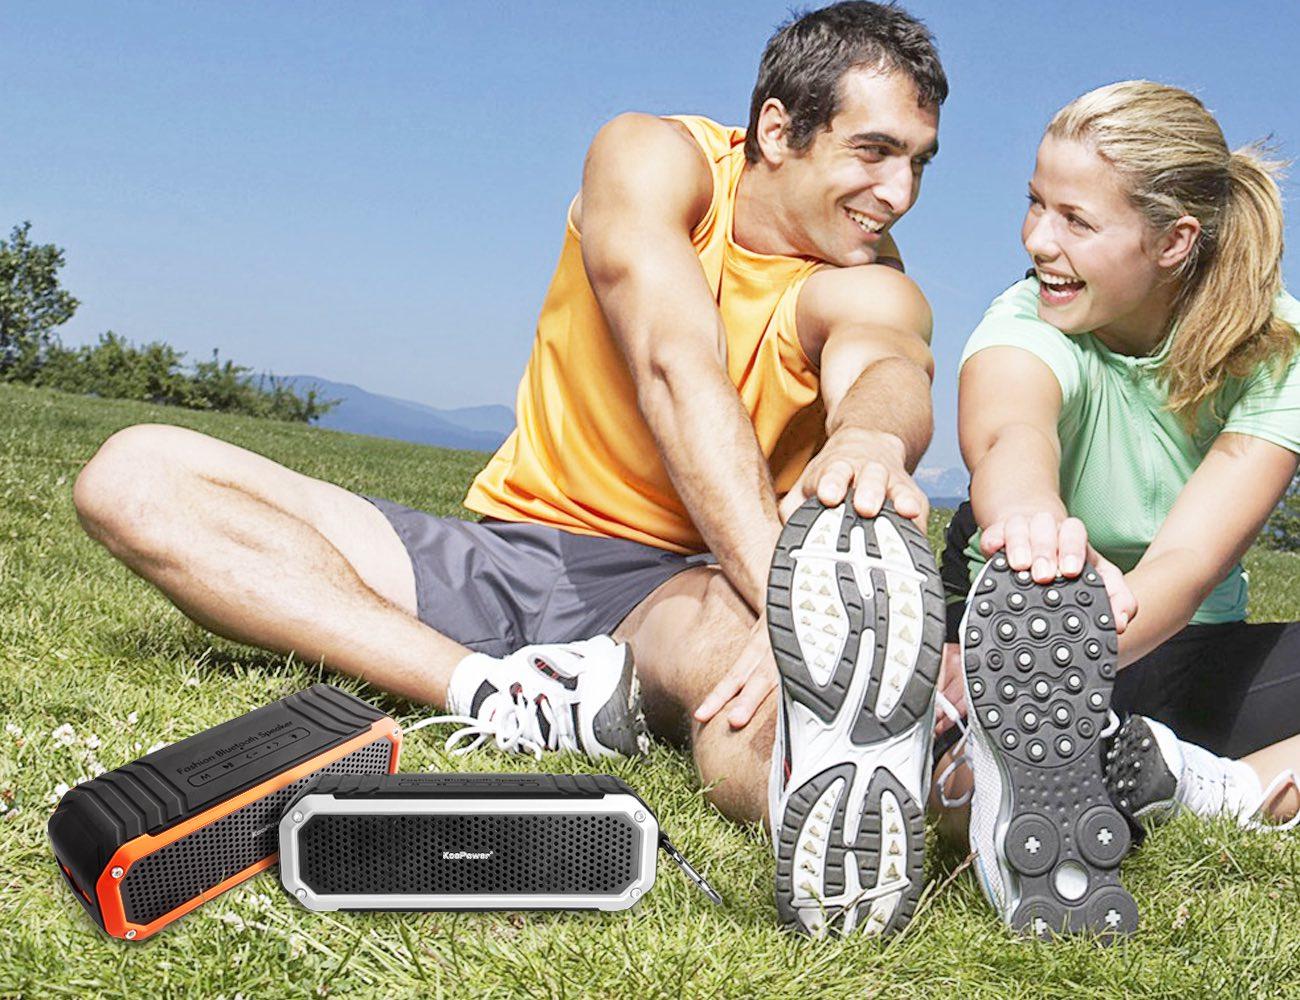 KooPower C26 – Wireless Bluetooth Speaker With Mic, Hook & Flashlight